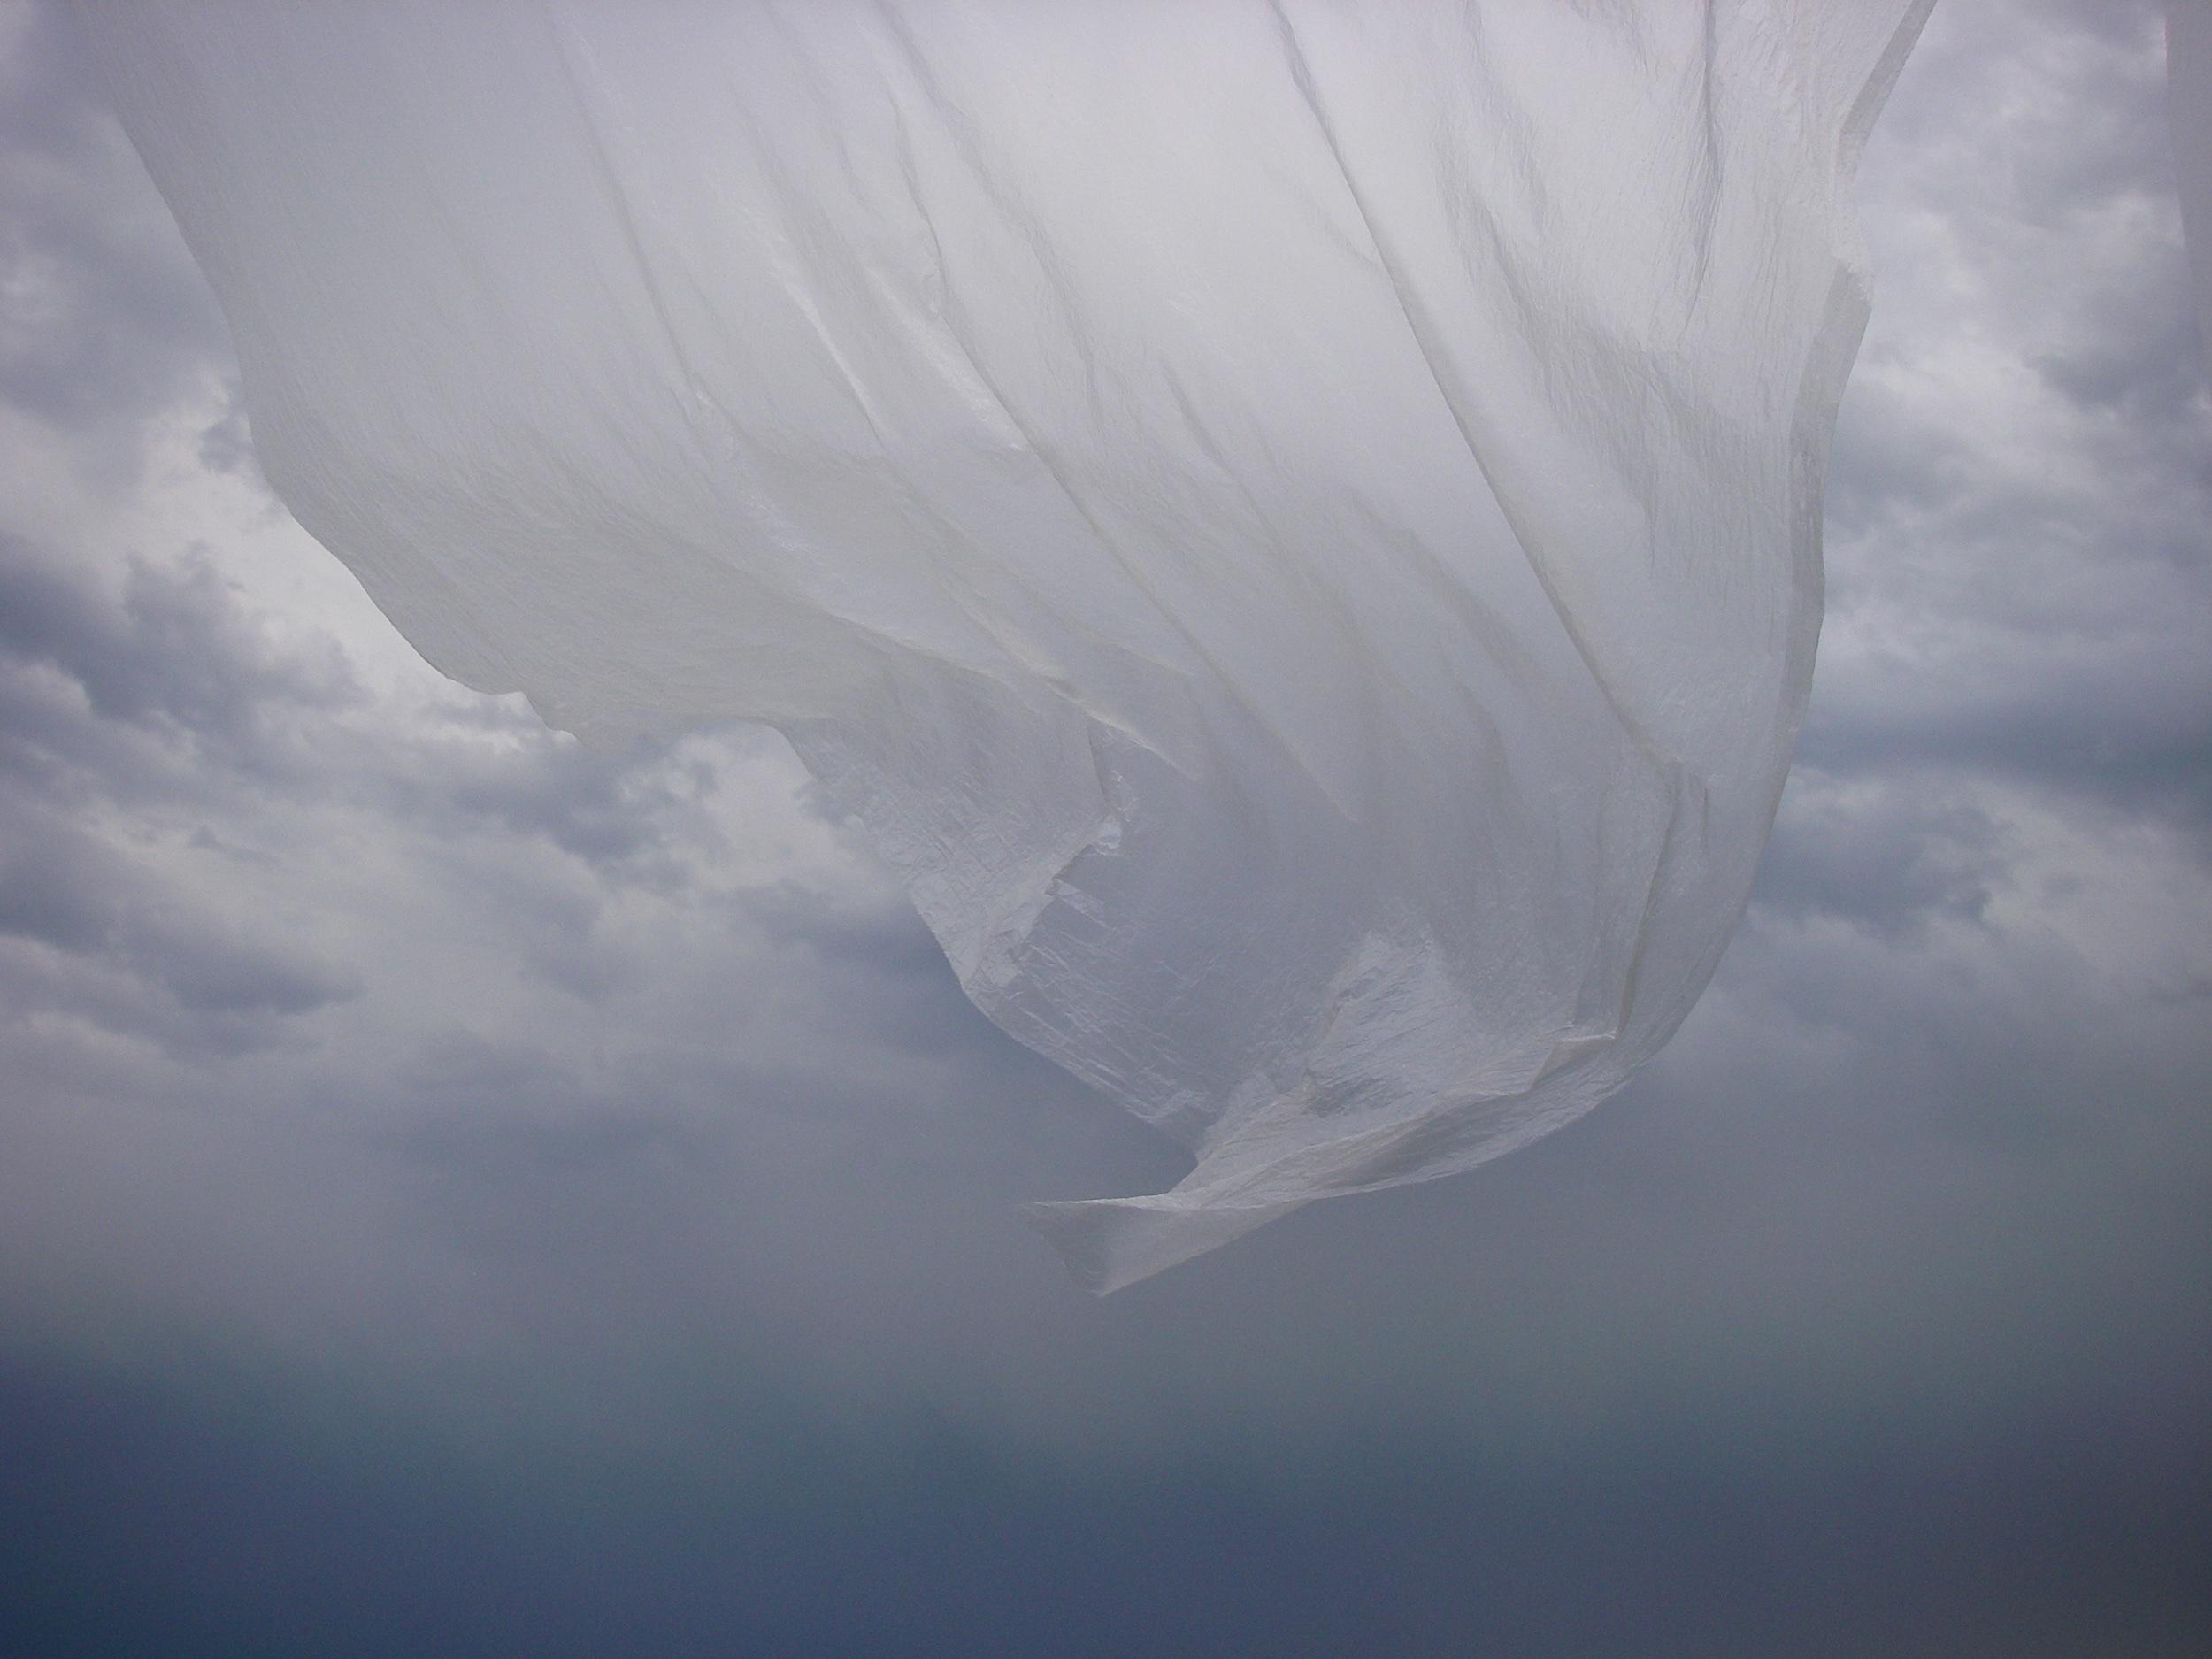 cloudforms_2500 5.jpg